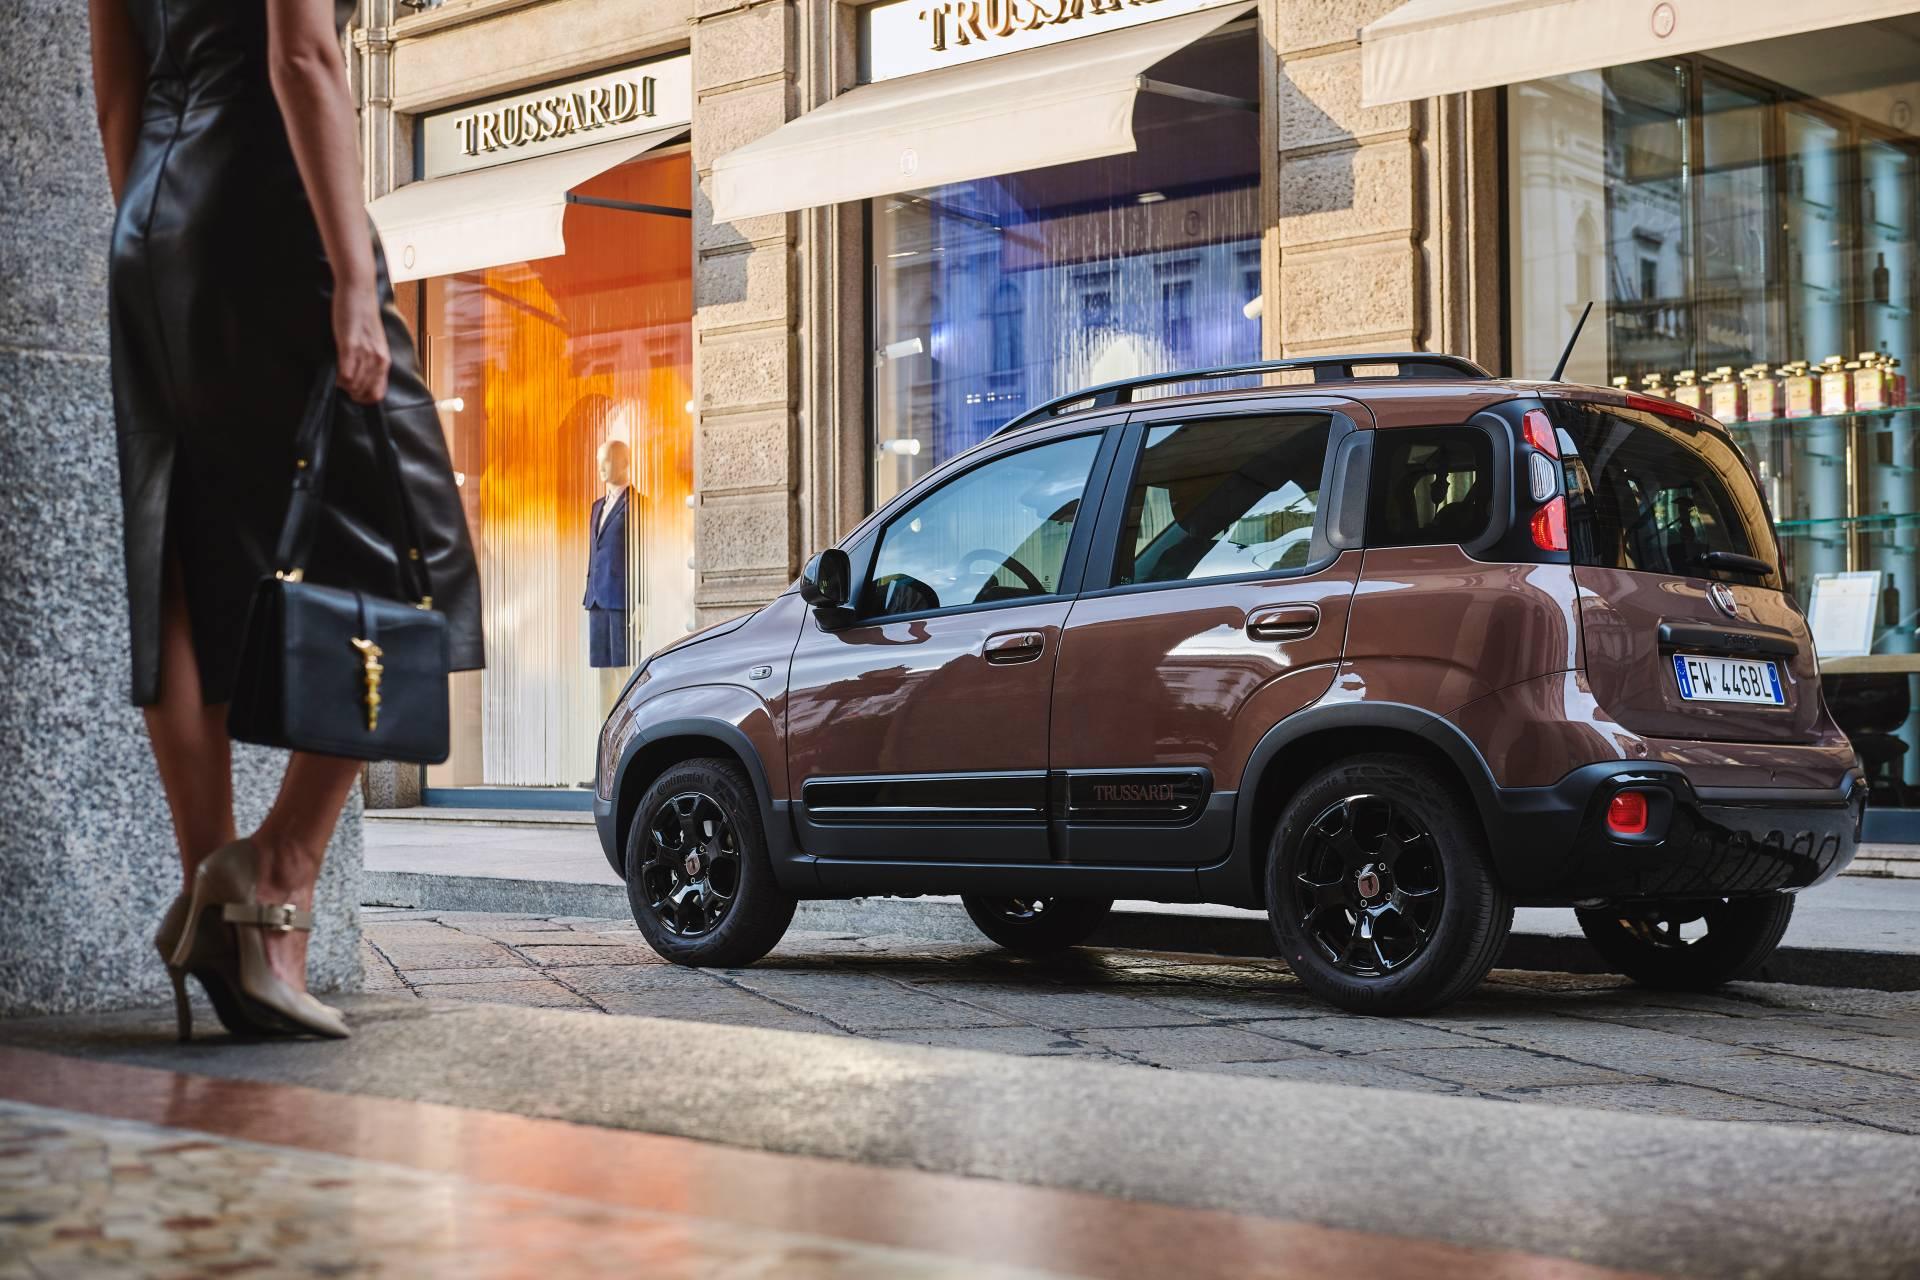 Fiat Panda Trussardi (4)